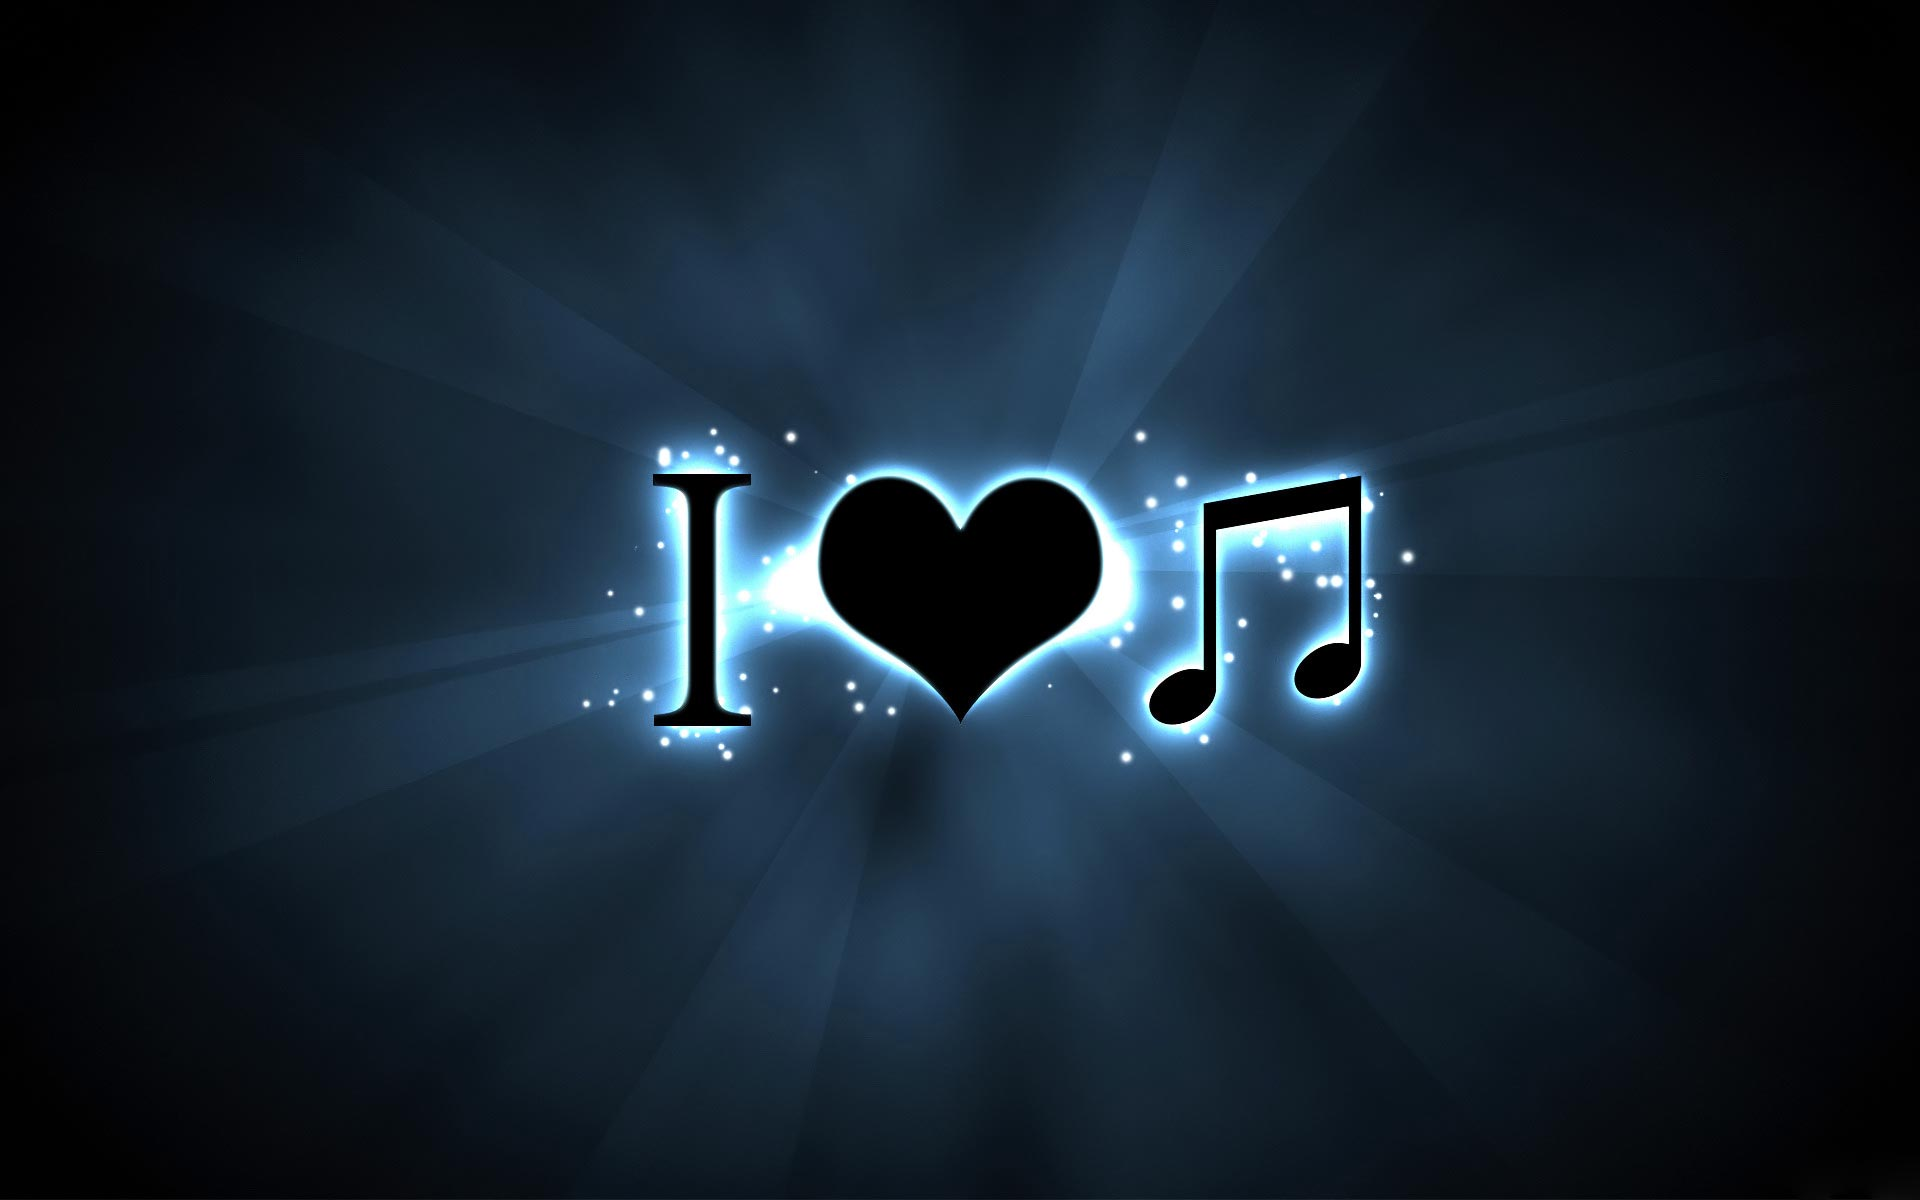 Cool Music Background - WallpaperSafari